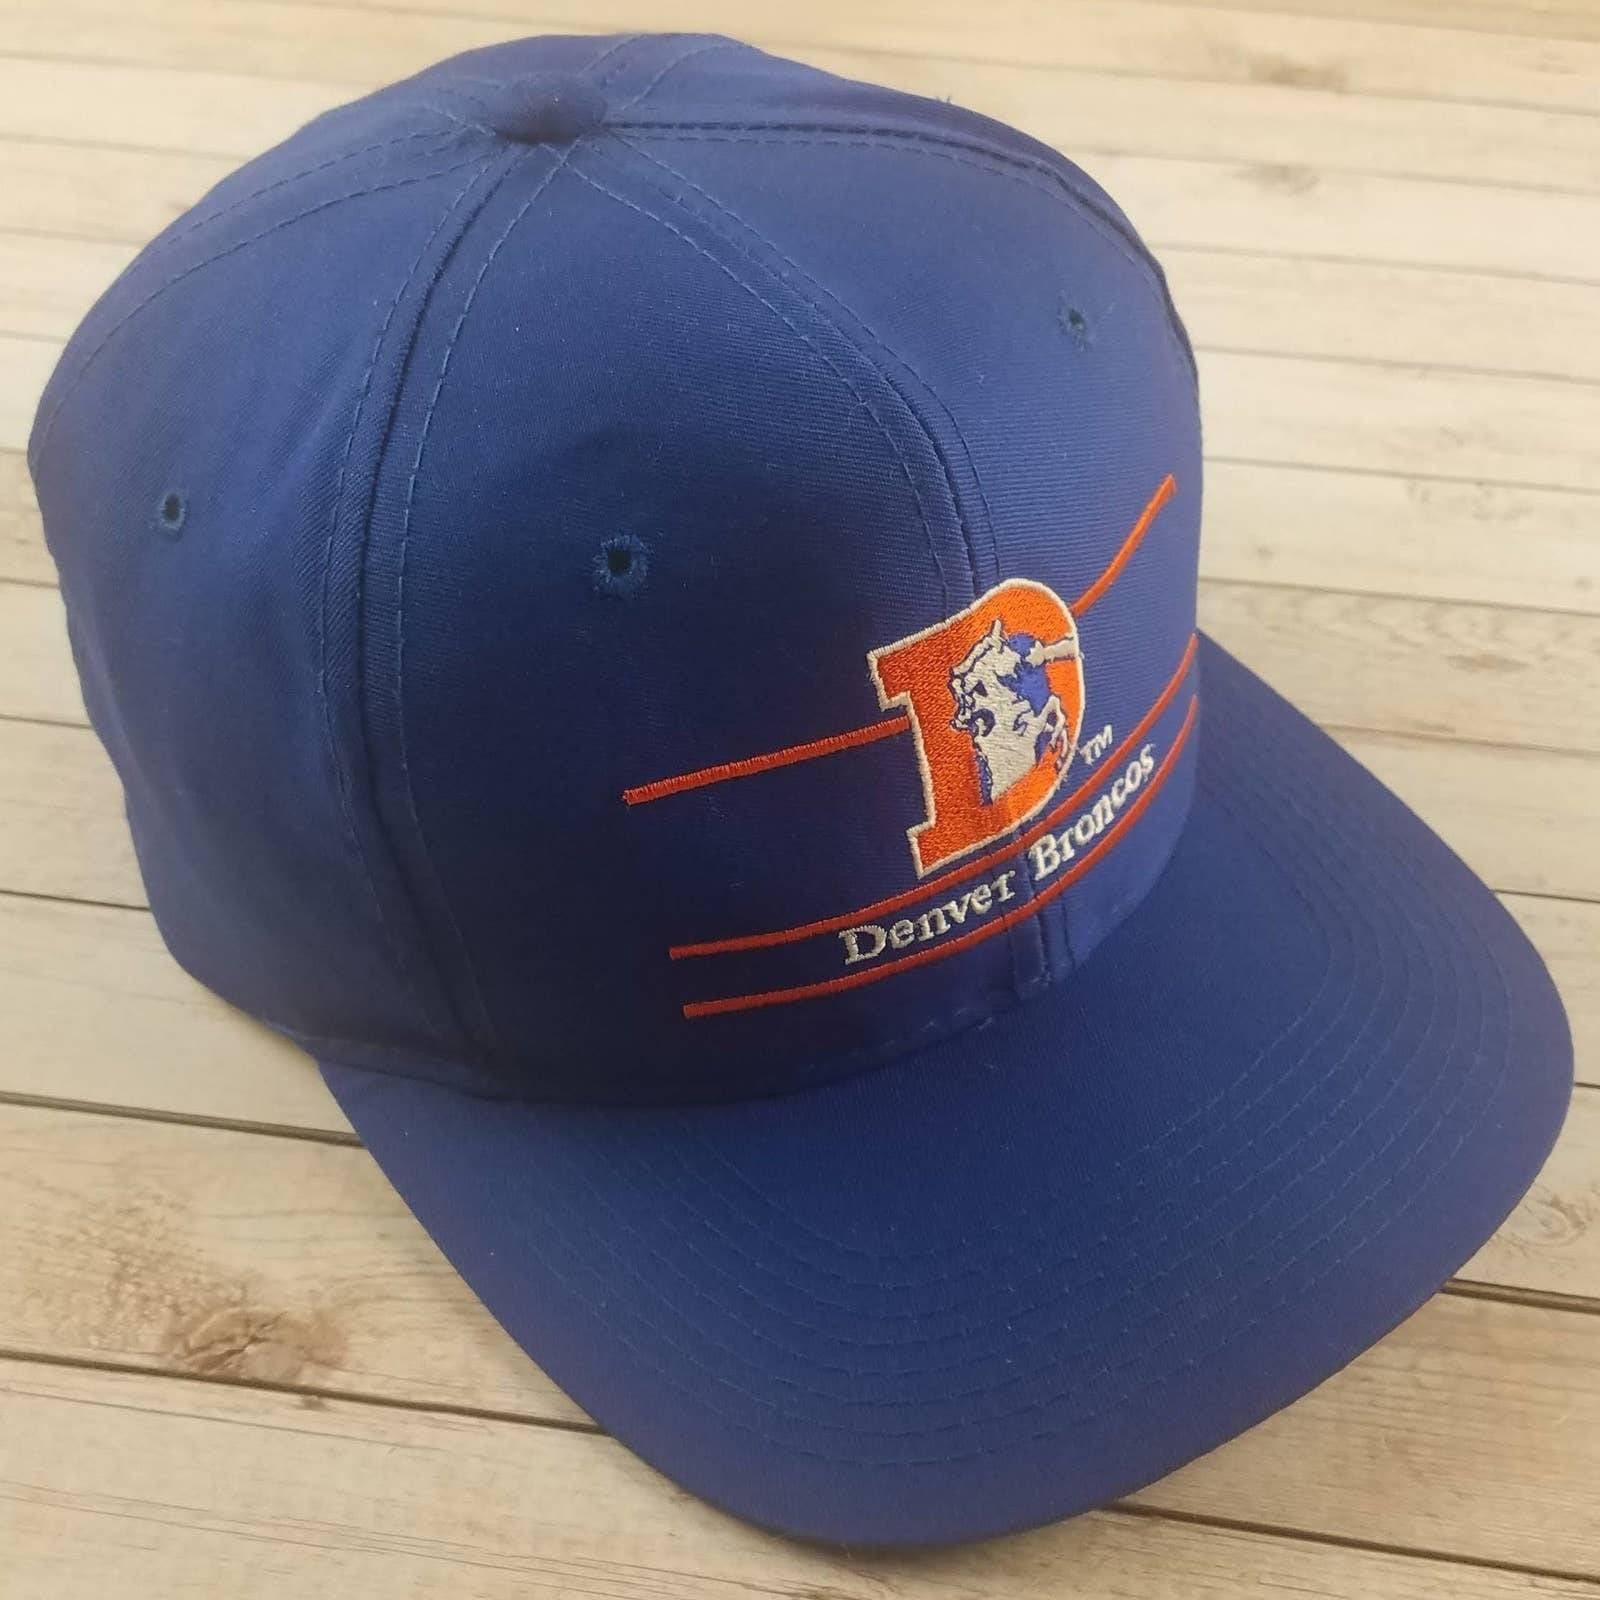 VTG 90s Denver Bronco AnnCo SplitBar Hat